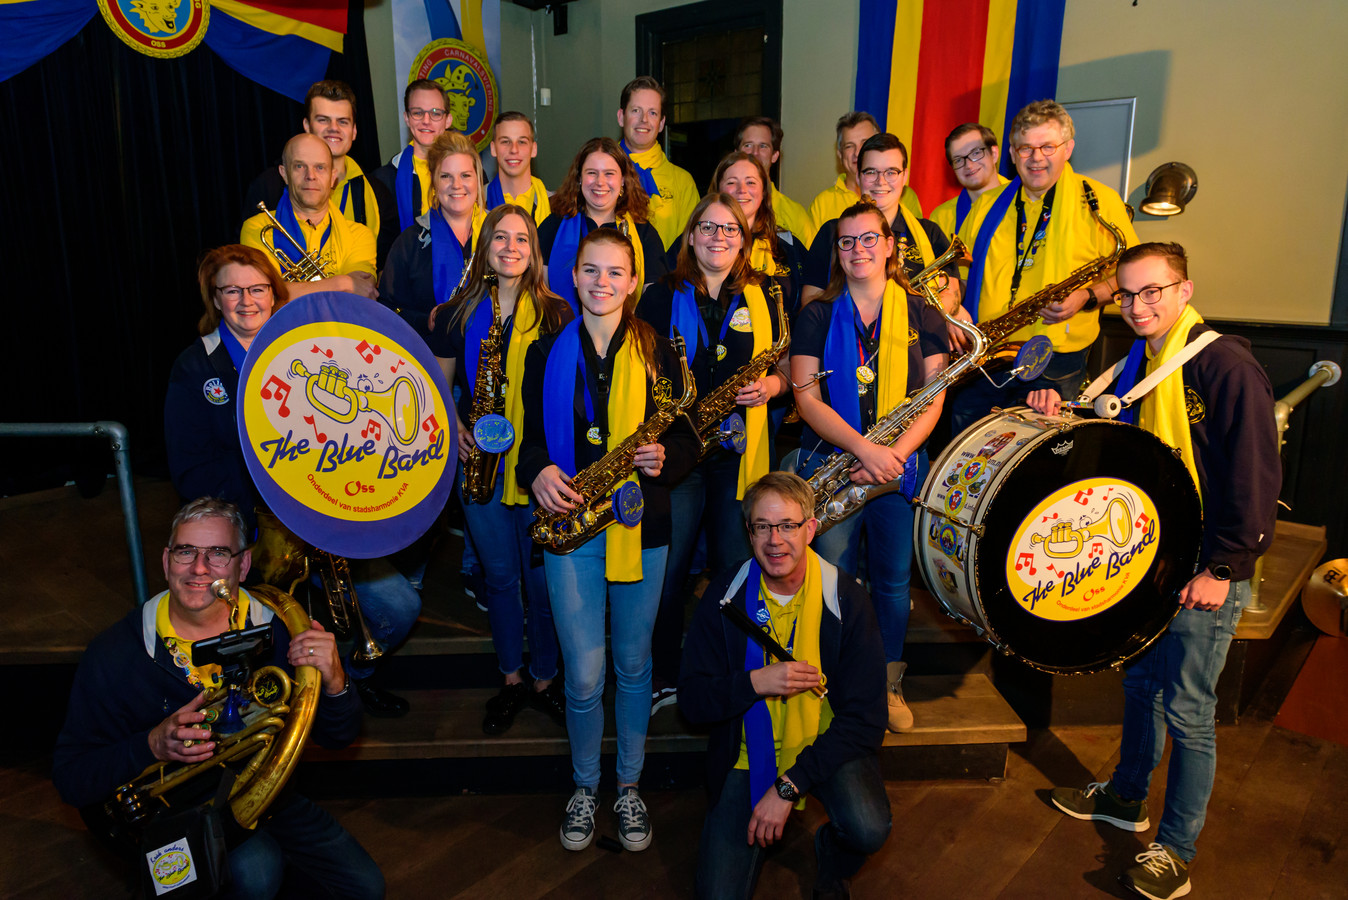 Dweilkapel The Blue Band viert zijn 22-jarig jubileum.